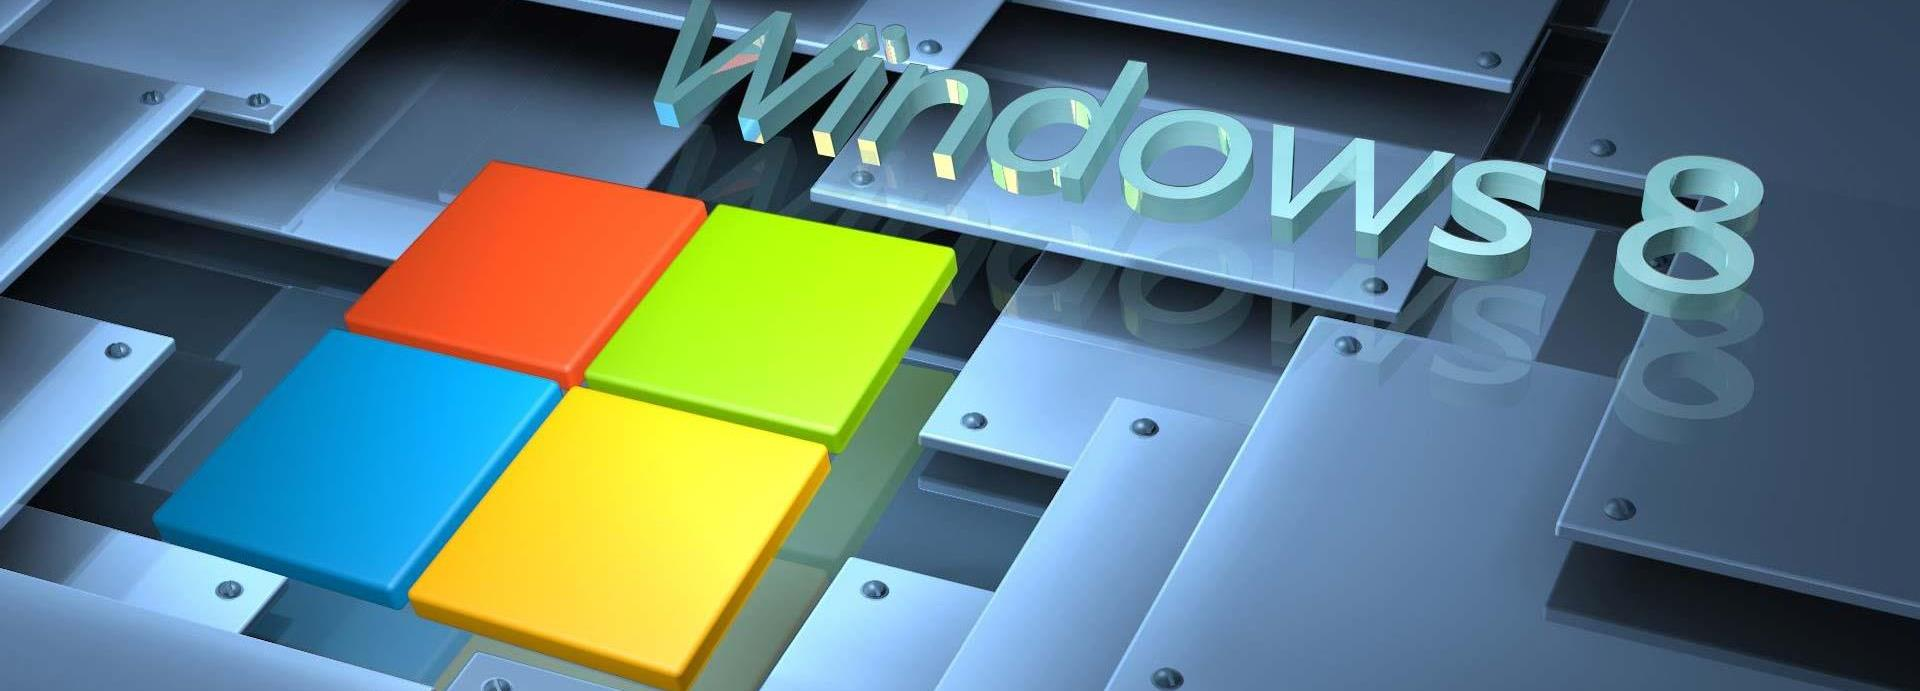 Servicii IT – Eroarea Limited Access la wireless dupa update la Windows 8.1